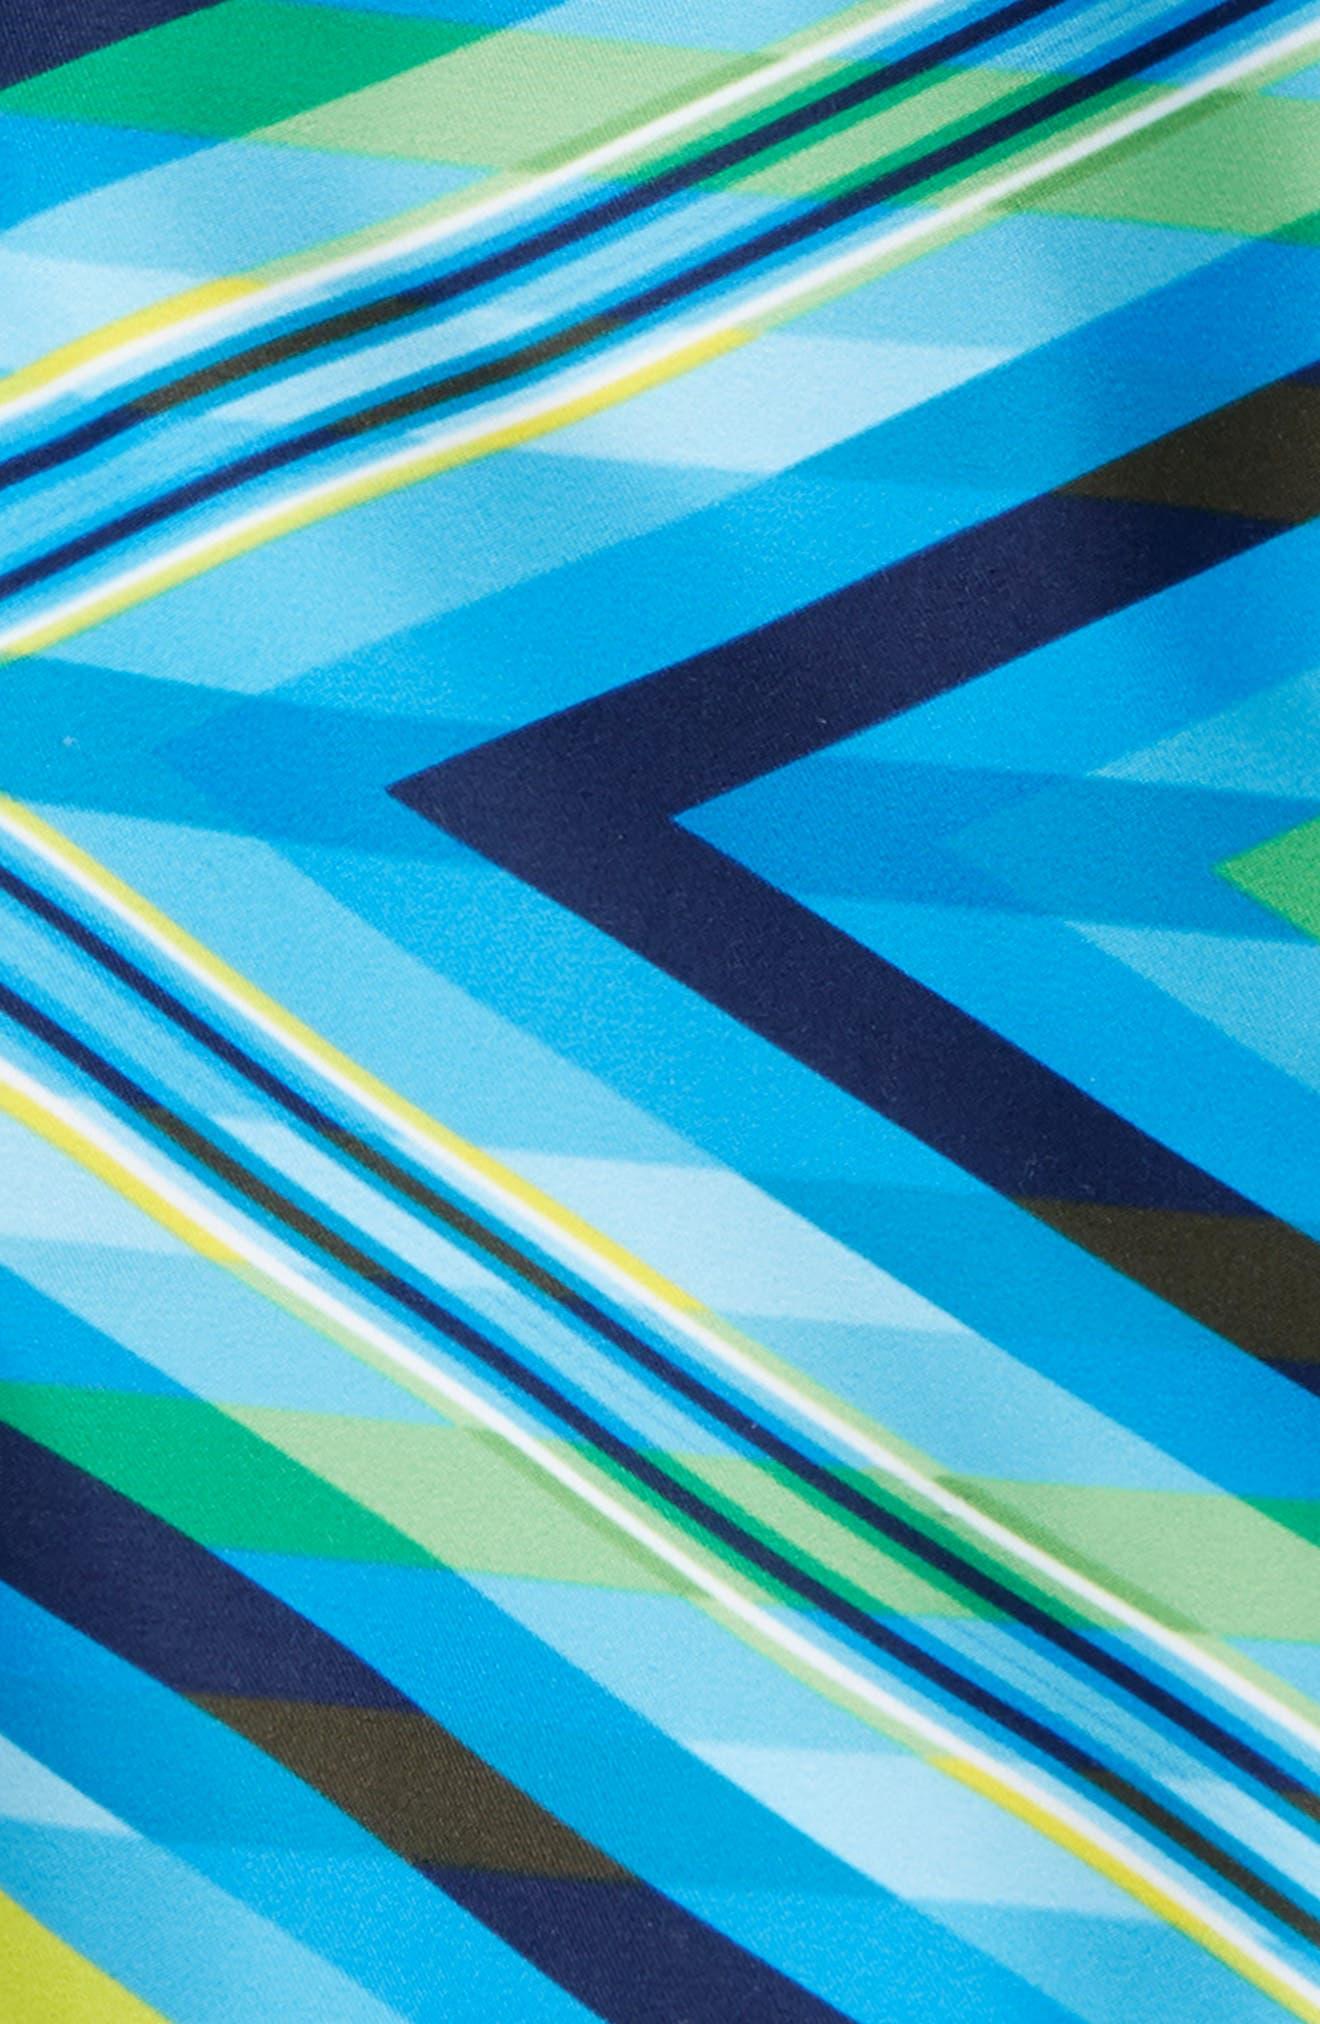 Geo Mirage Swim Trunks,                             Alternate thumbnail 2, color,                             Blue/ Yellow